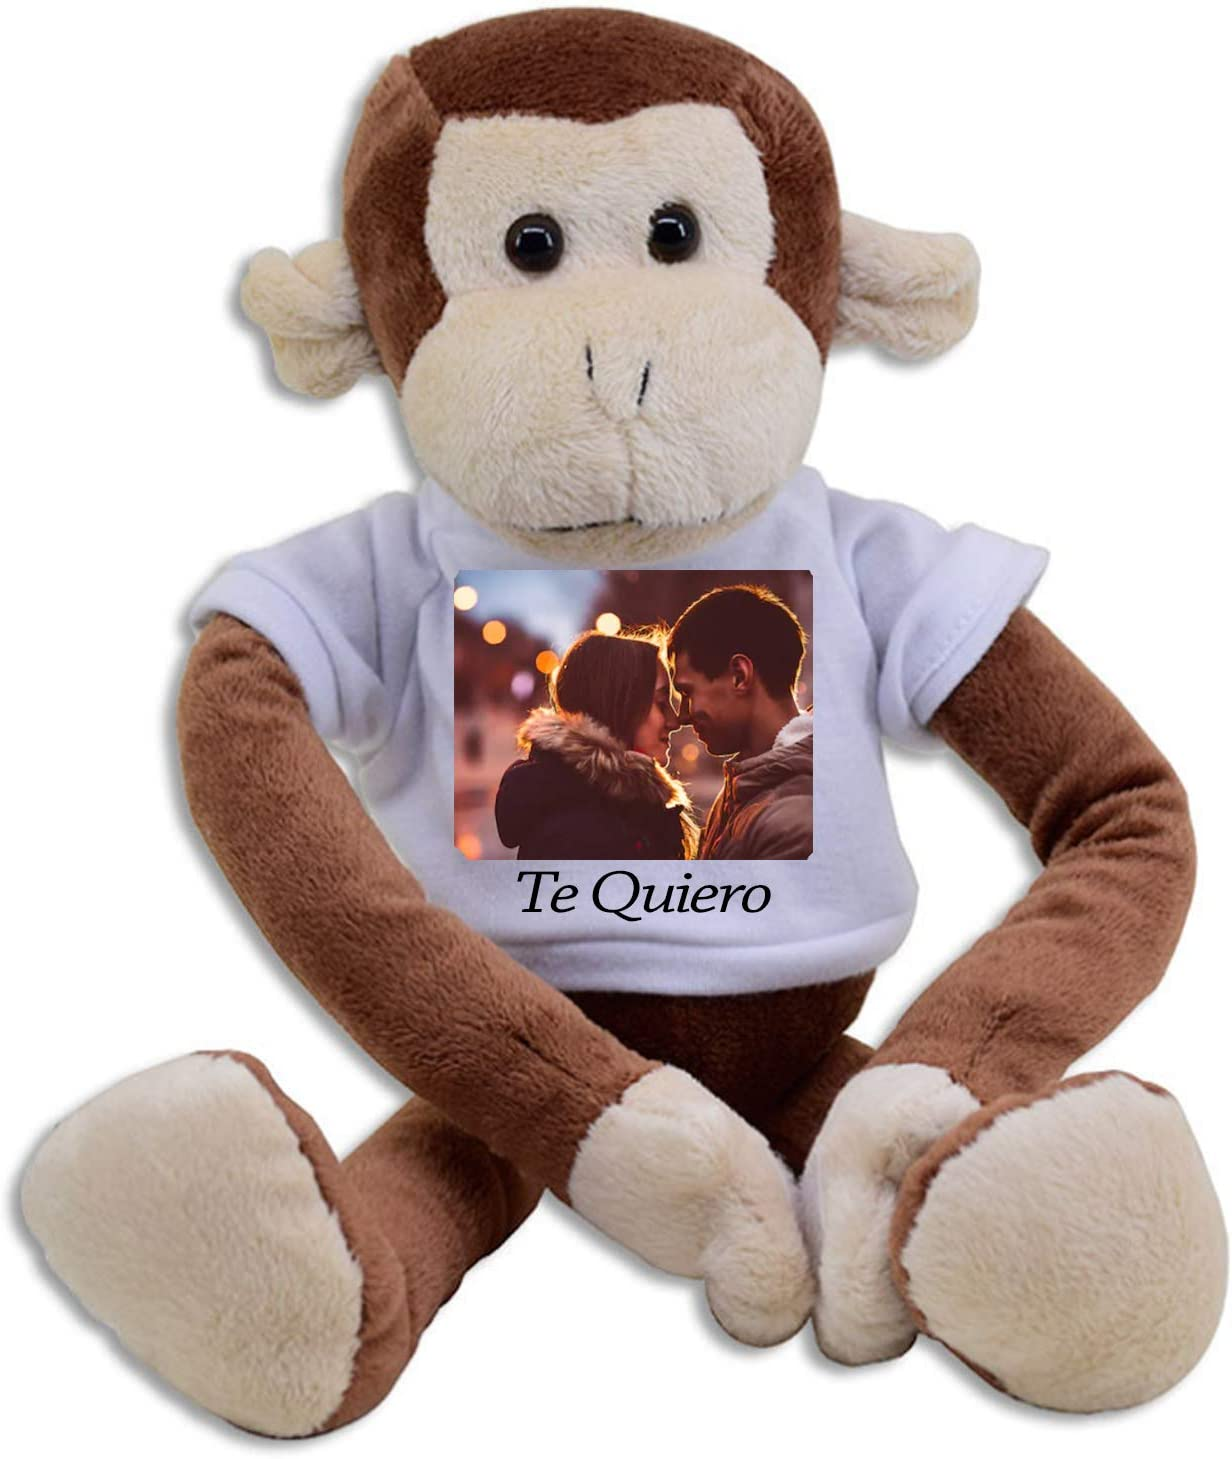 Peluches Personalizados - Peluches Grandes con Foto - CREA Tu Peluche con tu Foto Personalizada - Impresión dpi - Tamaño Grande - Bebe con Nombre - Mono Reno Jirafa- (Mono)